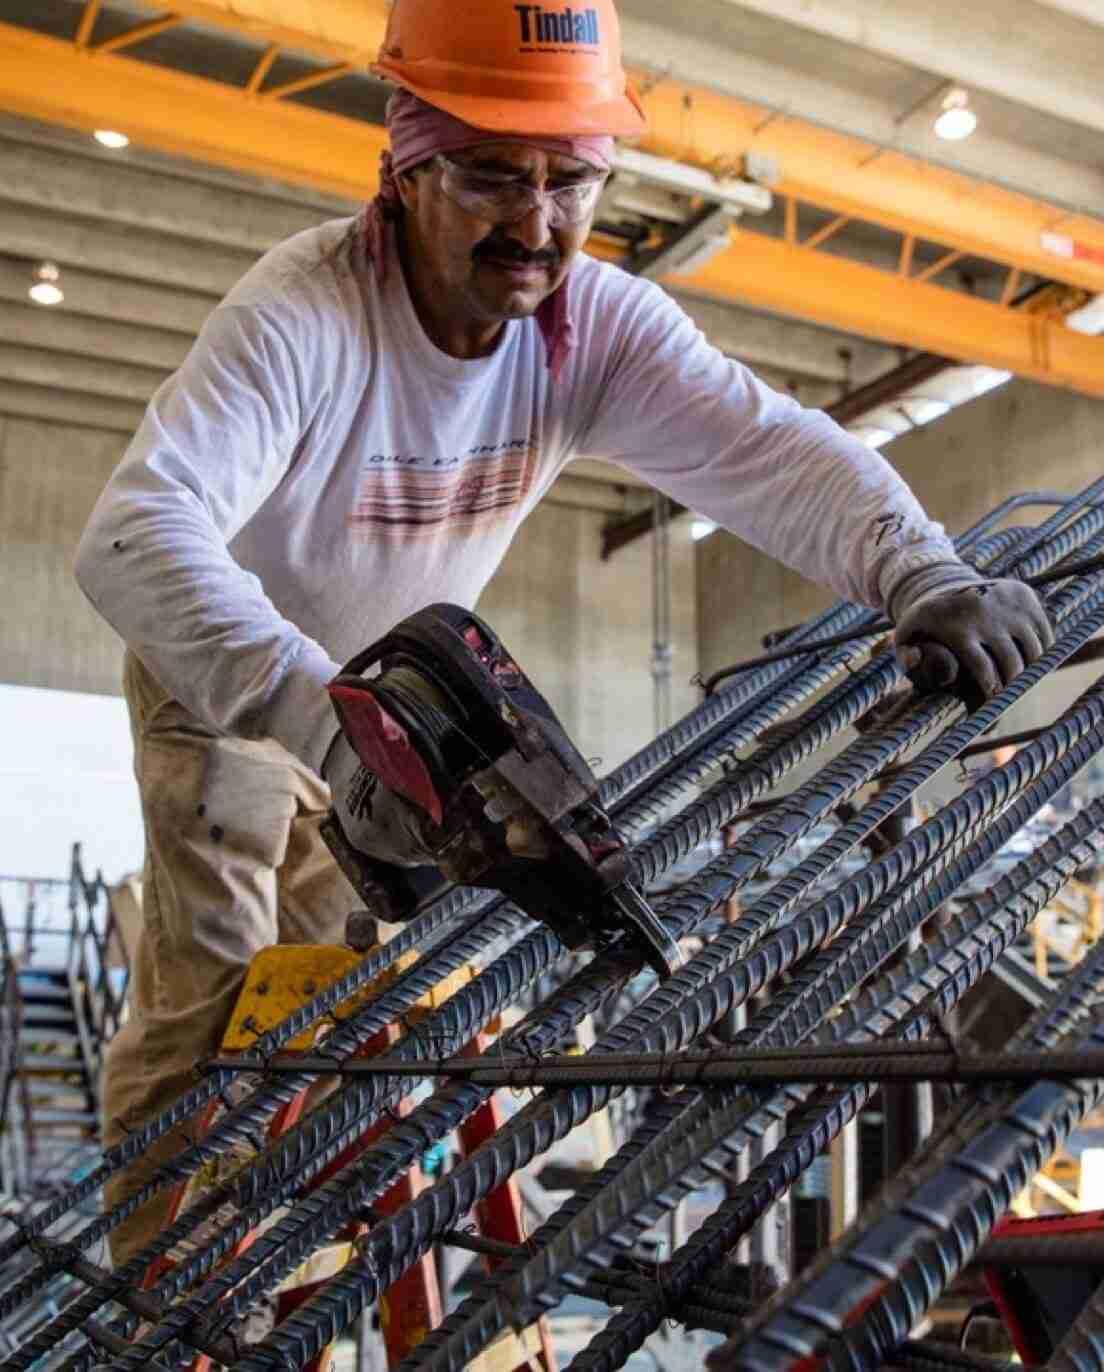 Tindall Precast Plant Worker Safety Georgia